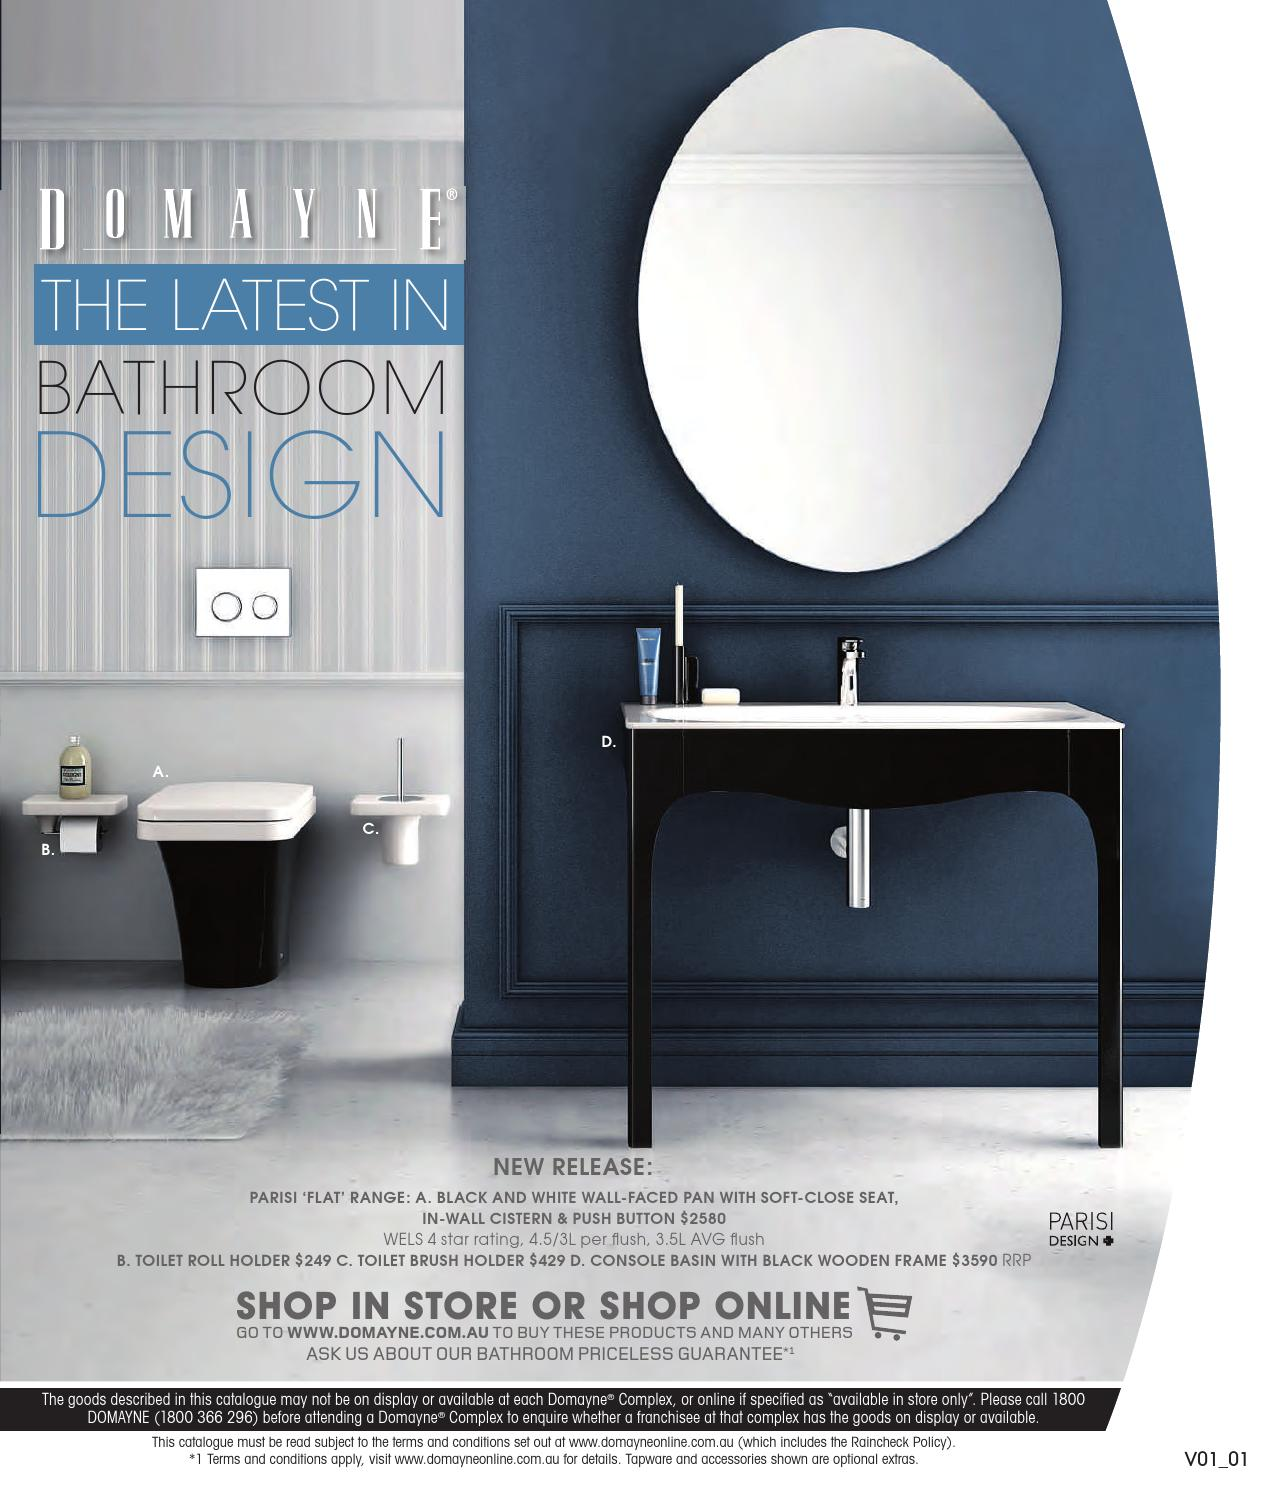 The Latest In Bathroom Designs by Domayne - issuu